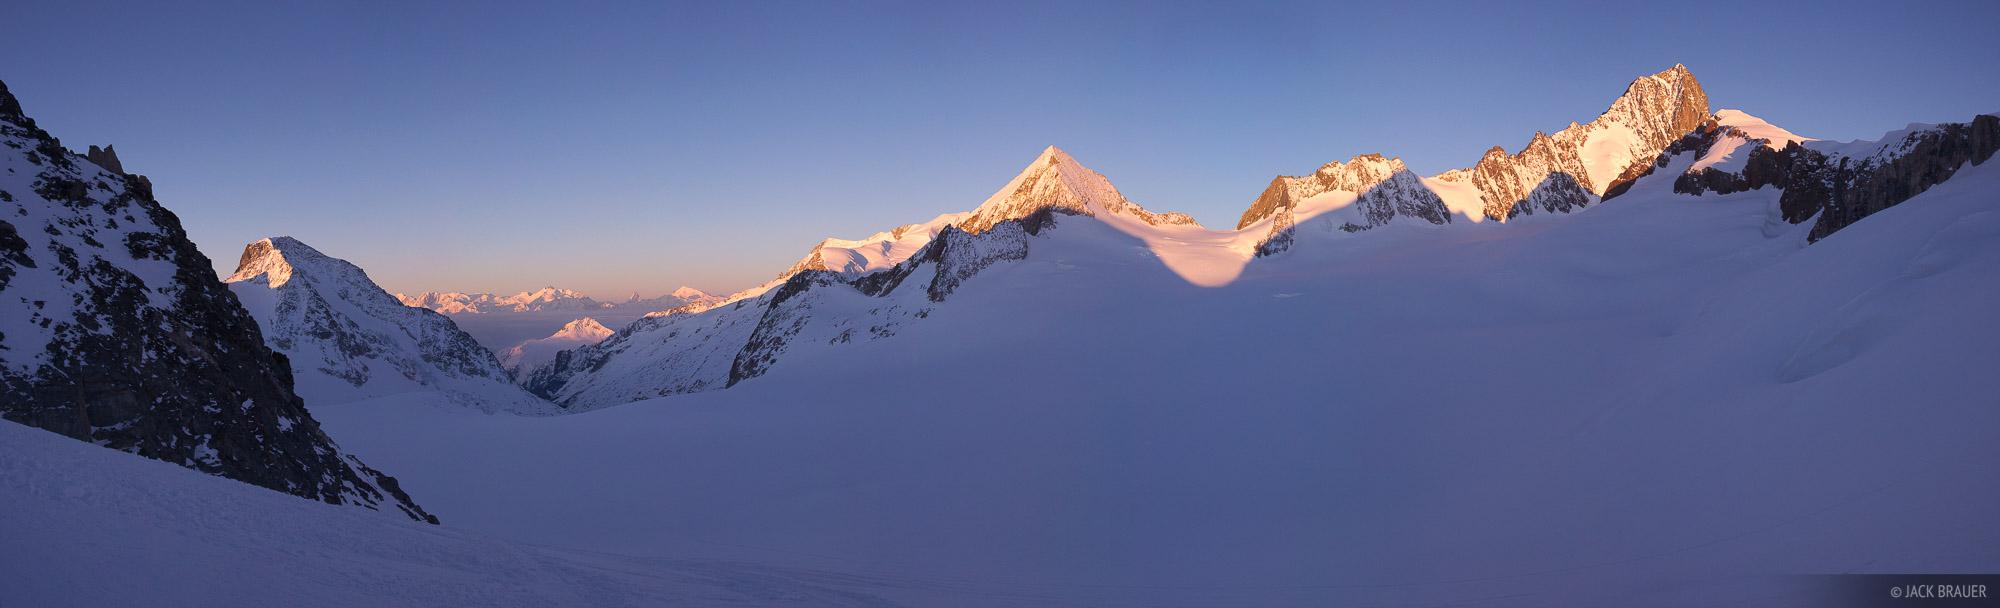 Bernese Oberland,Europe,Switzerland, Matterhorn, panorama, photo